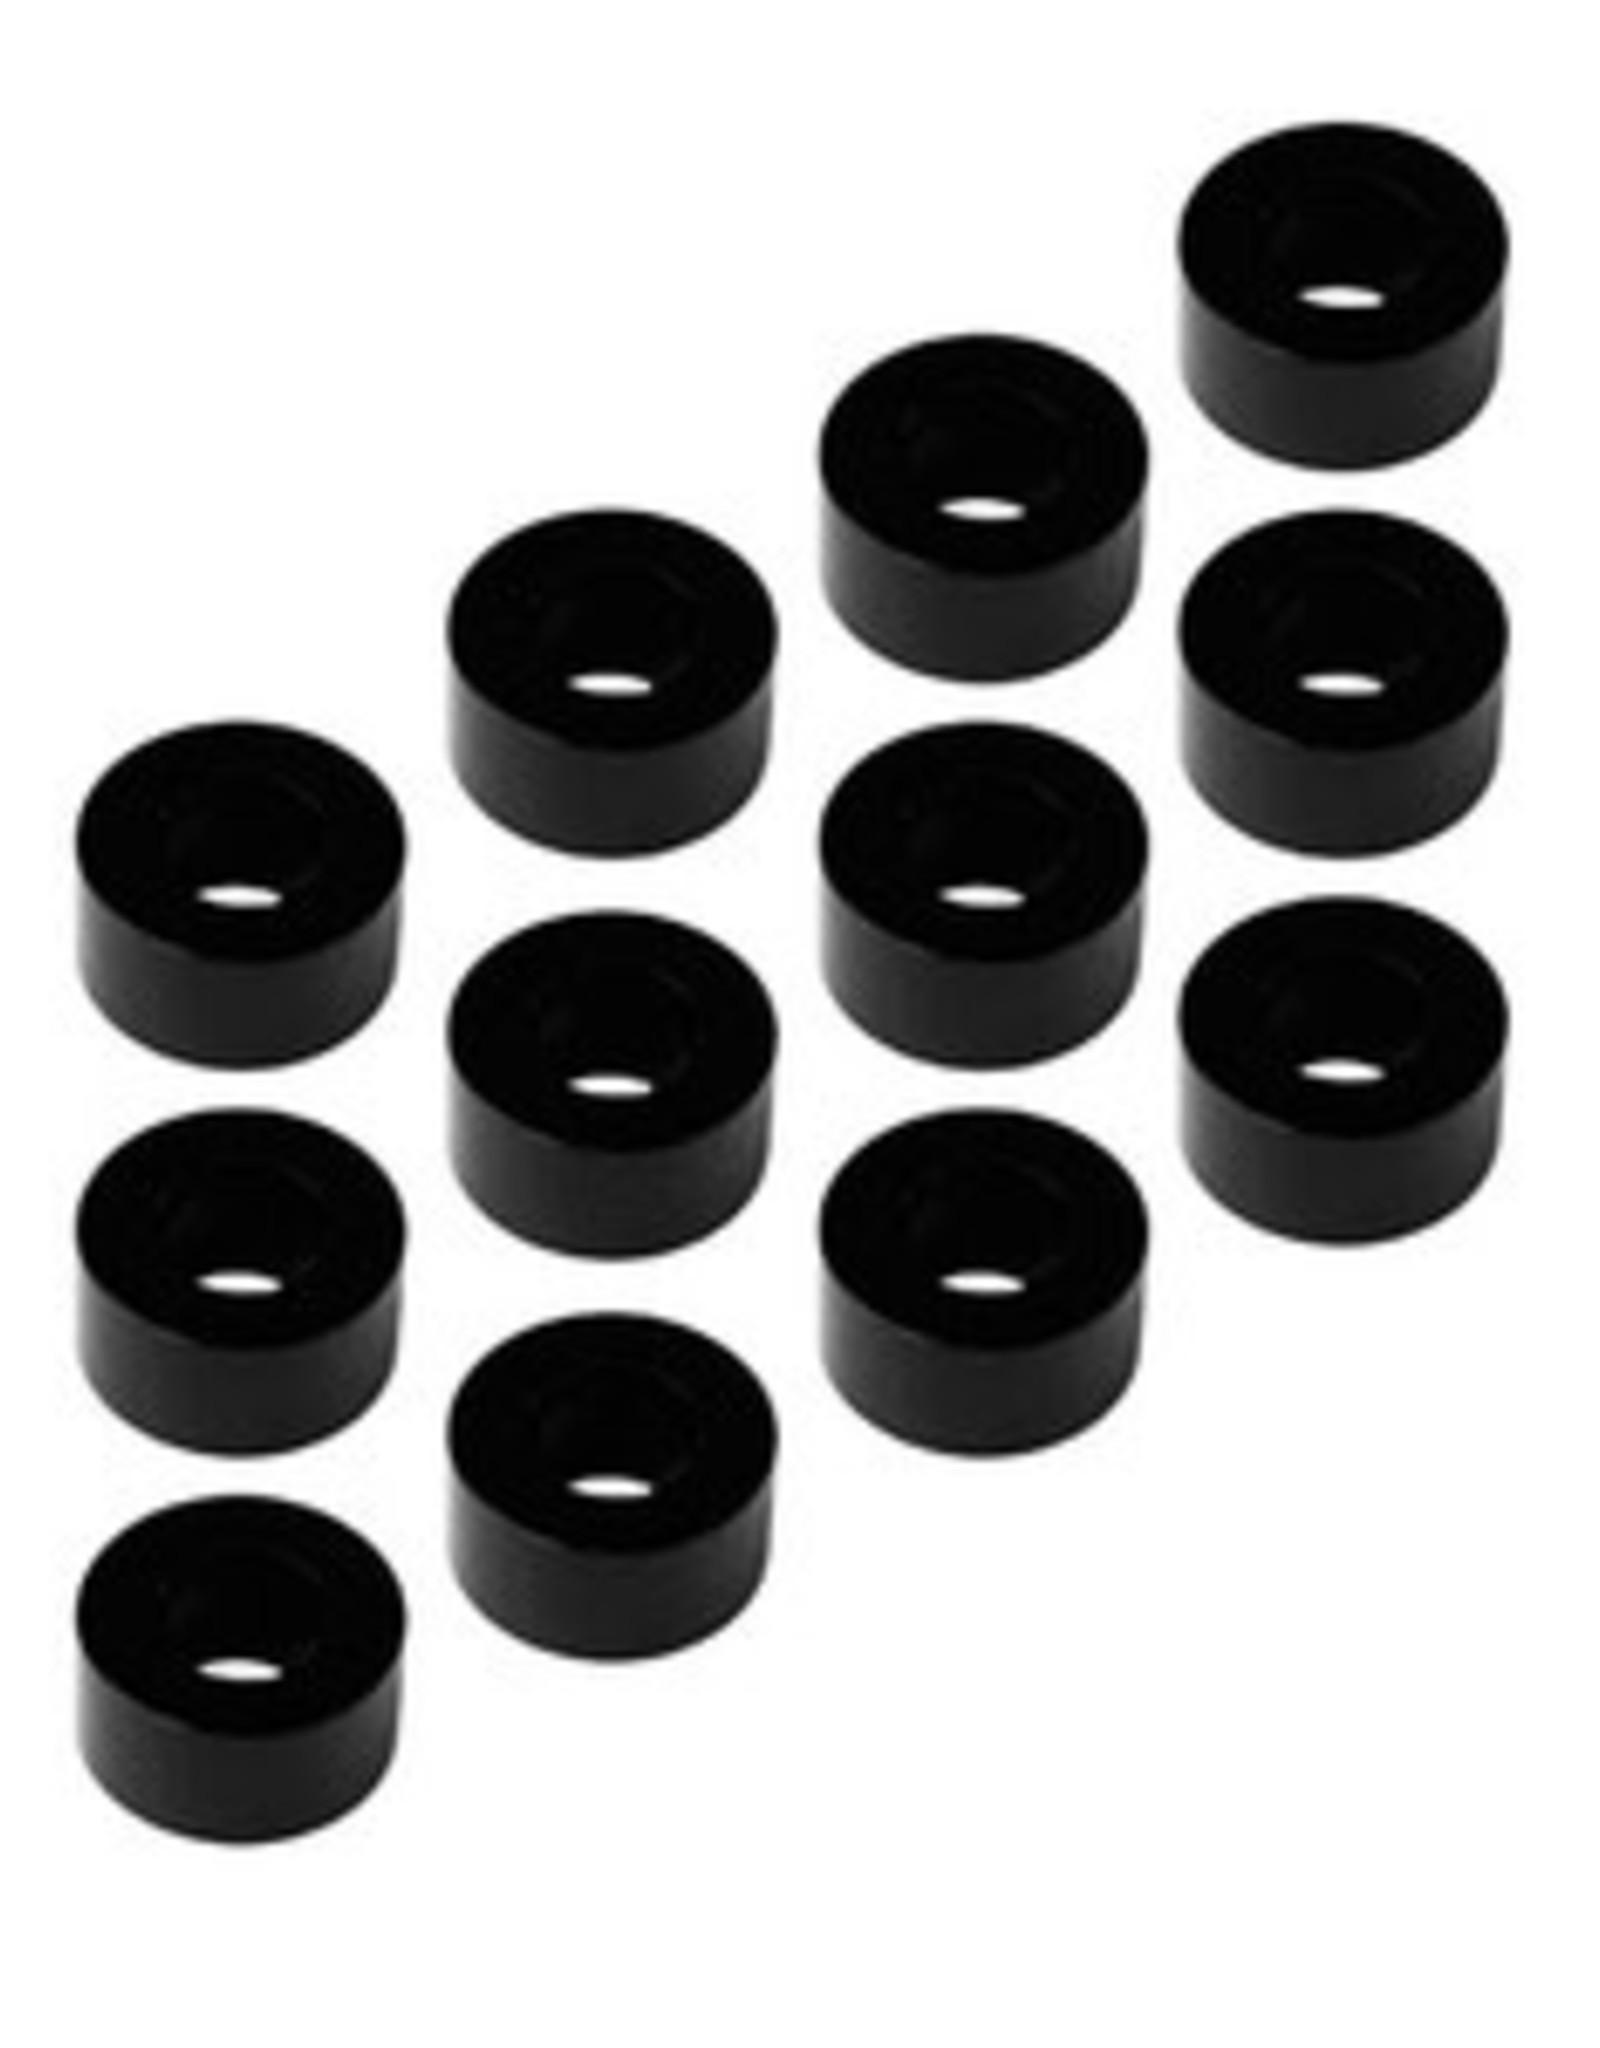 1UP 1UP 3x6x3mm Precision Aluminum Shims, Black, 12pcs